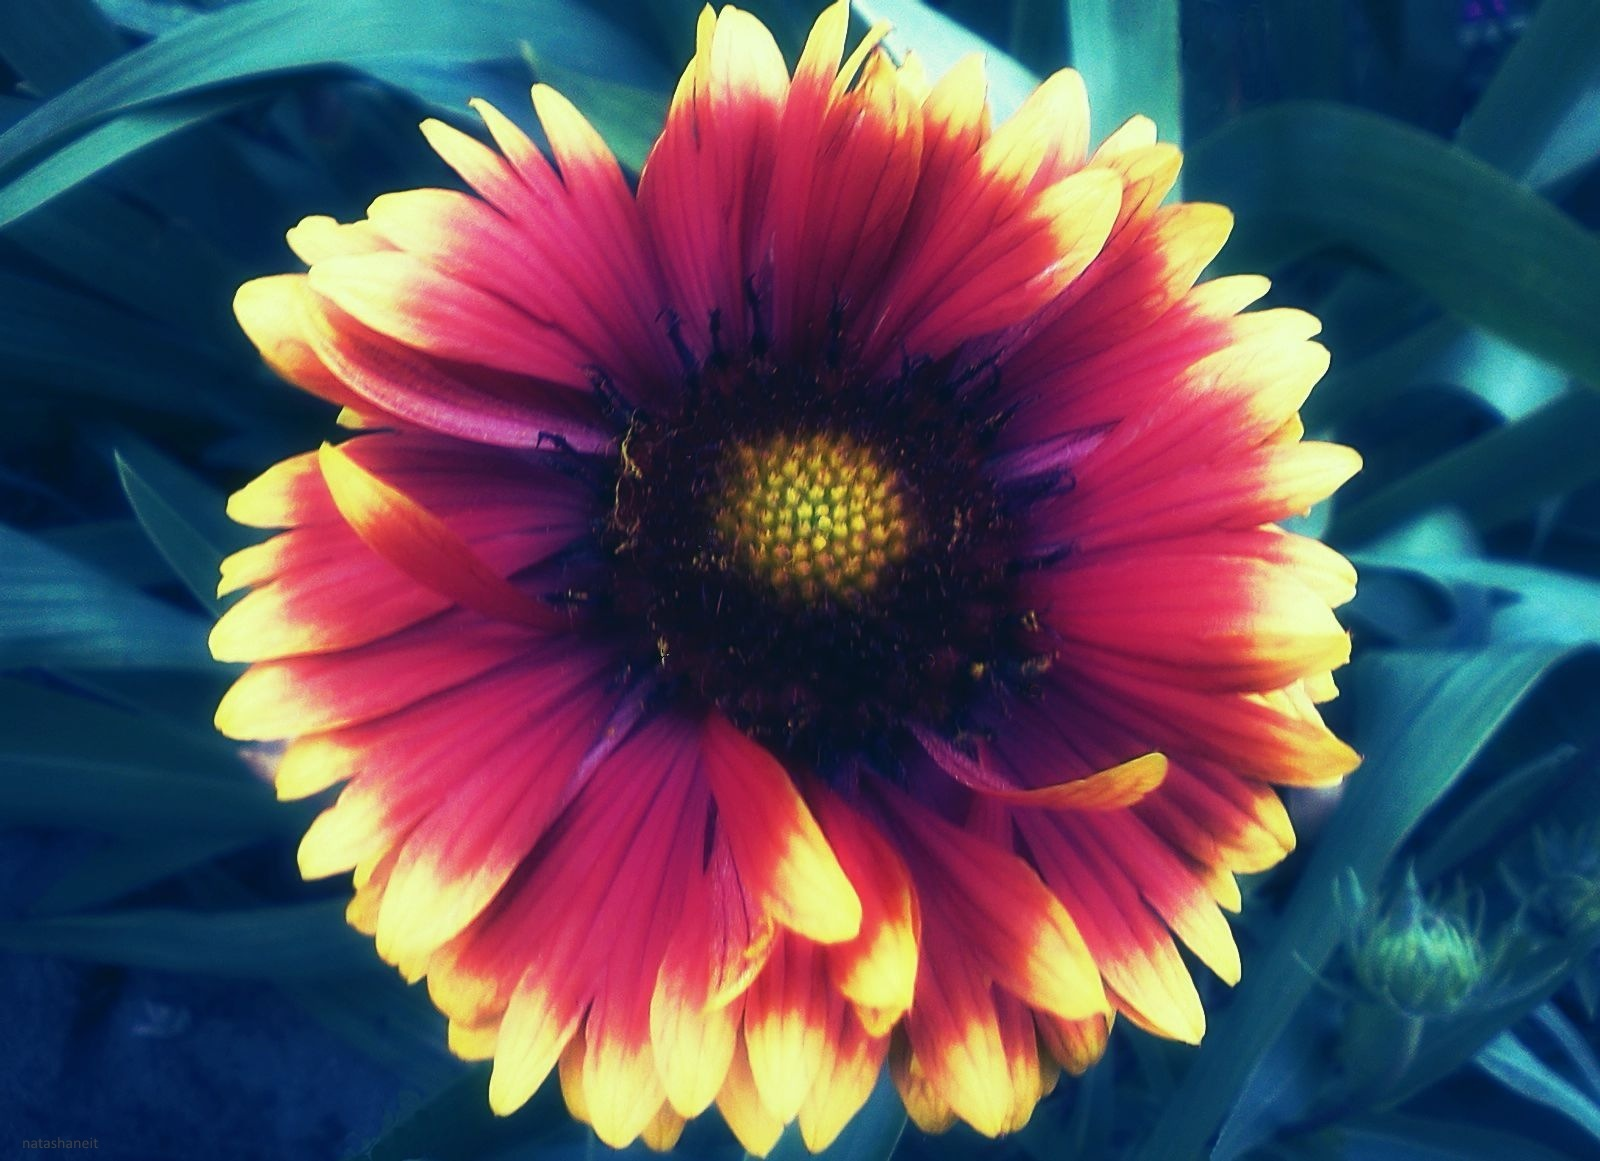 Flower and bud by natashaneit